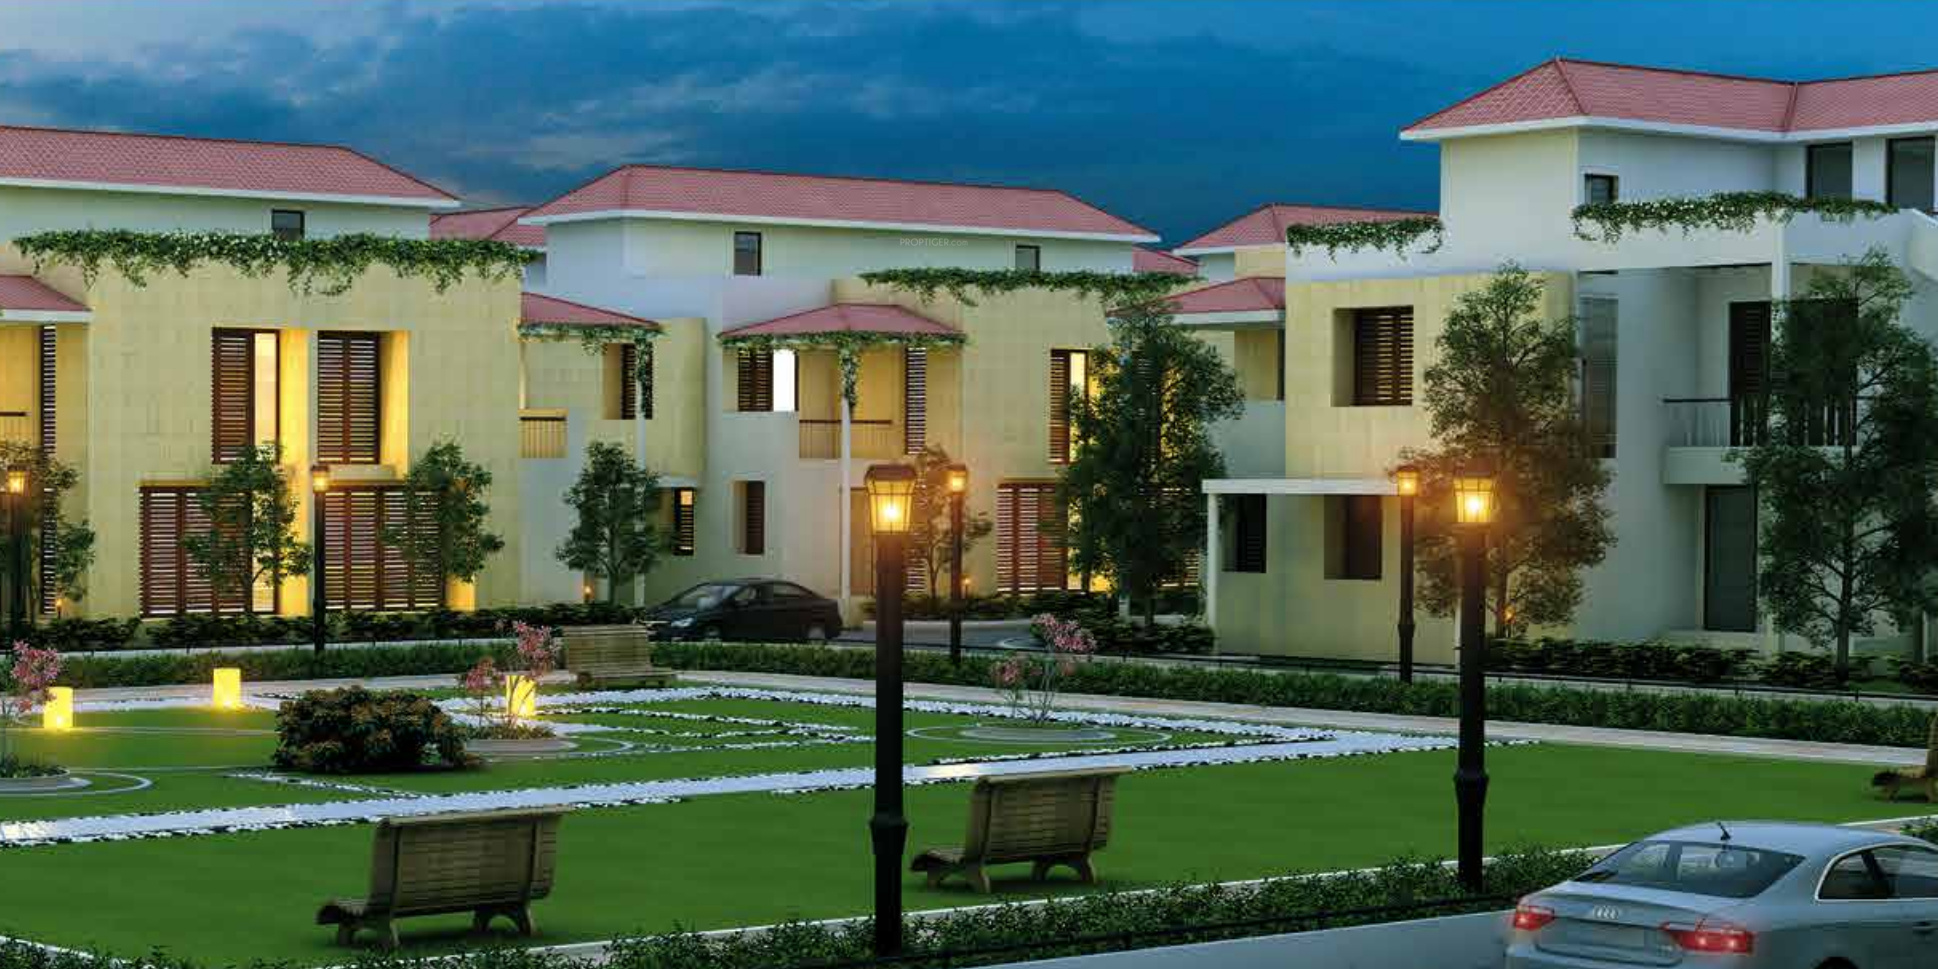 1850 sq ft 3 BHK 3T Villa for Sale in Adventz Infraworld Zuari ...